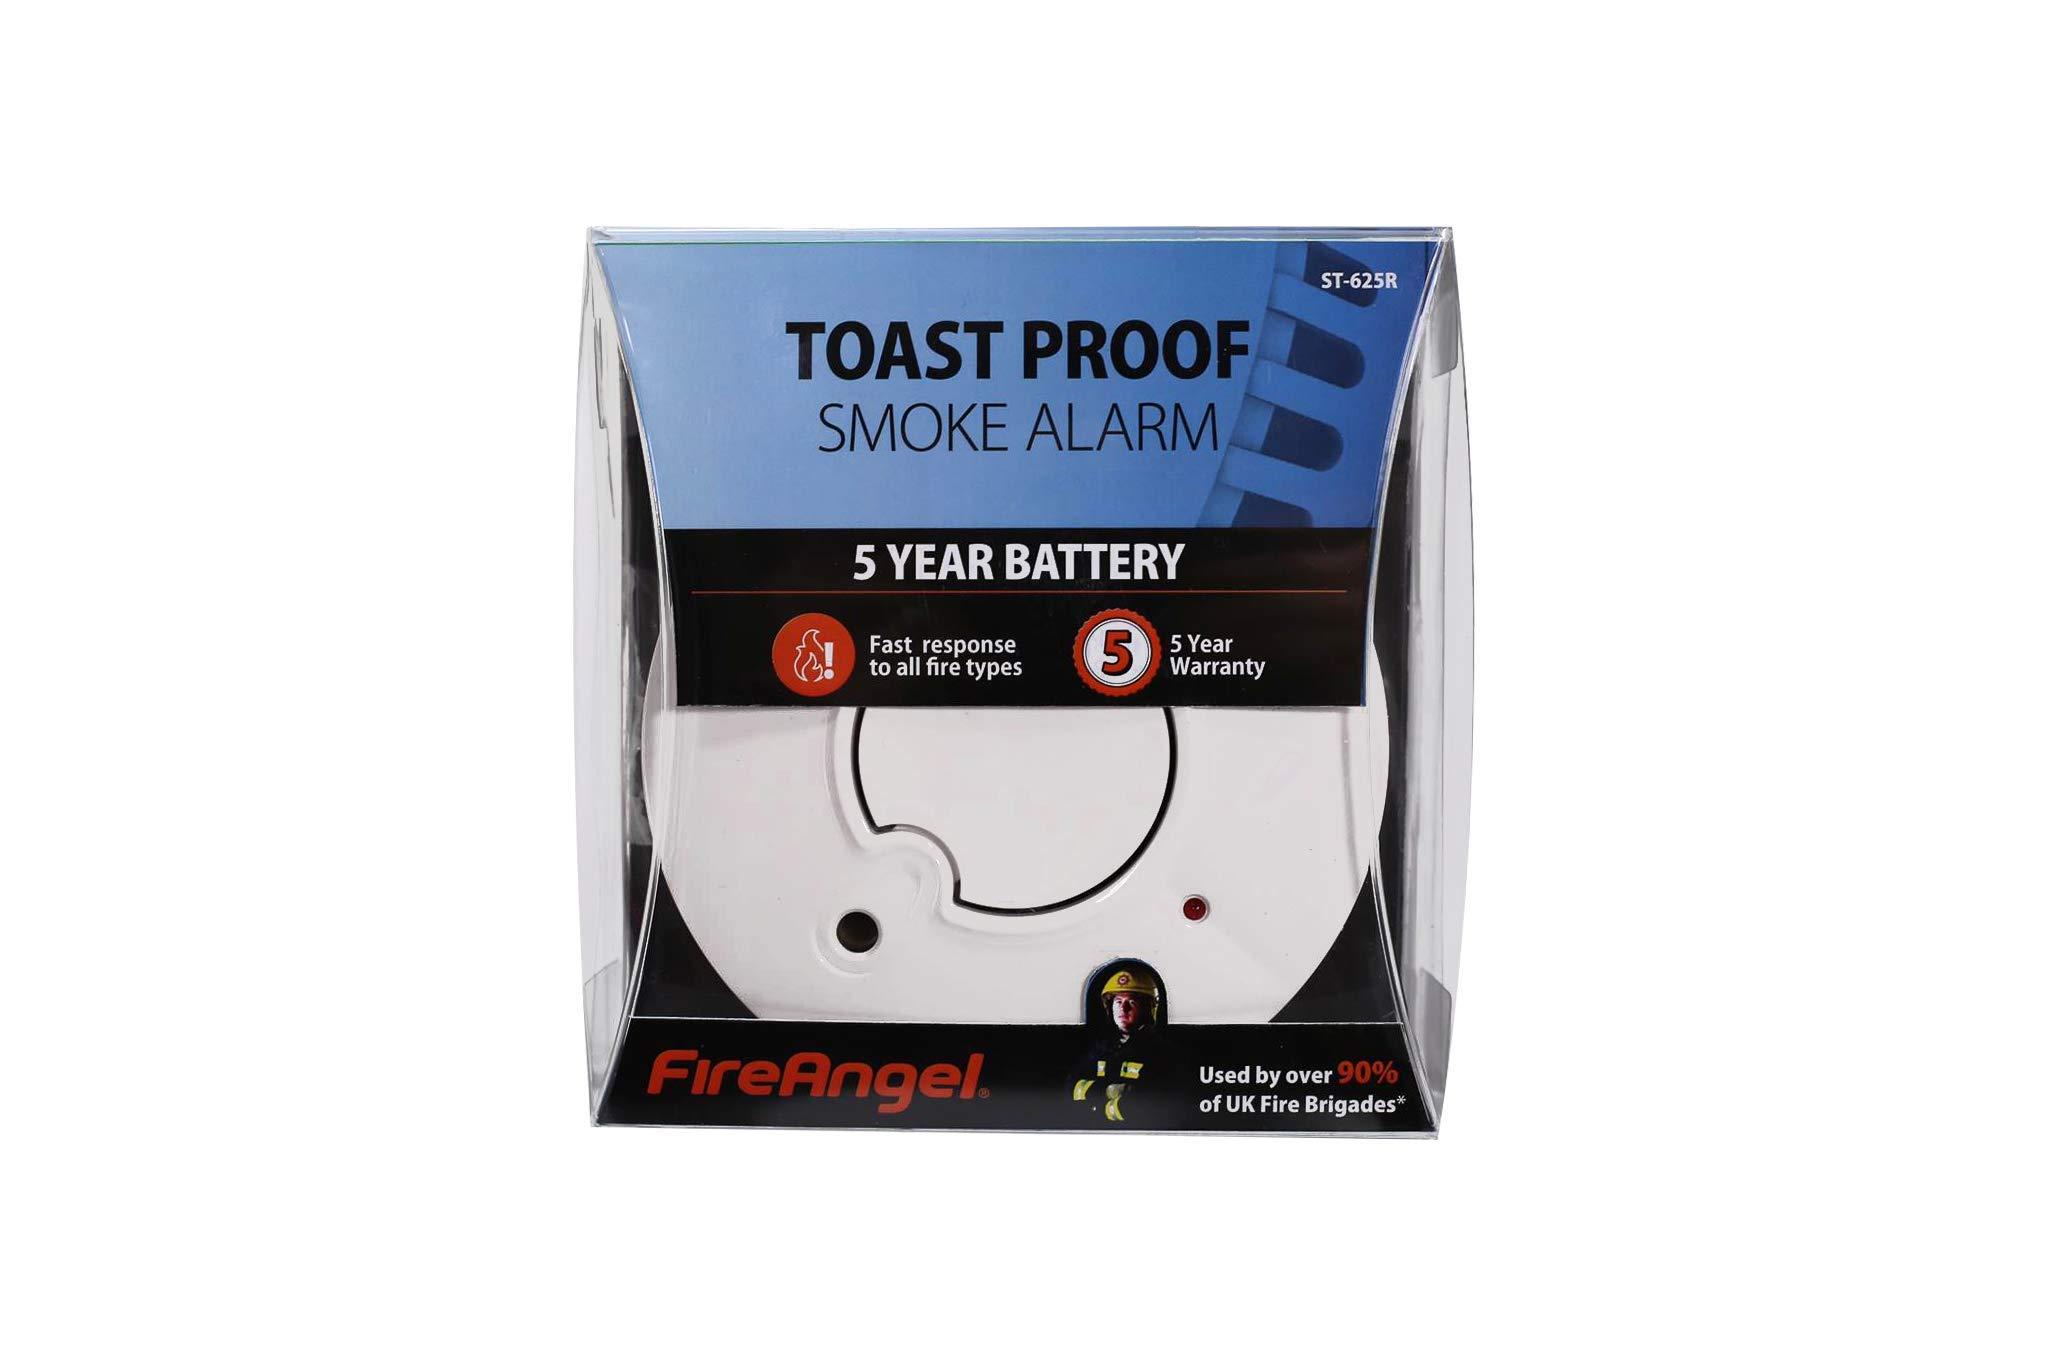 Thermoptek Toast Proof Smoke Alarm - FireAngel ST-625 6